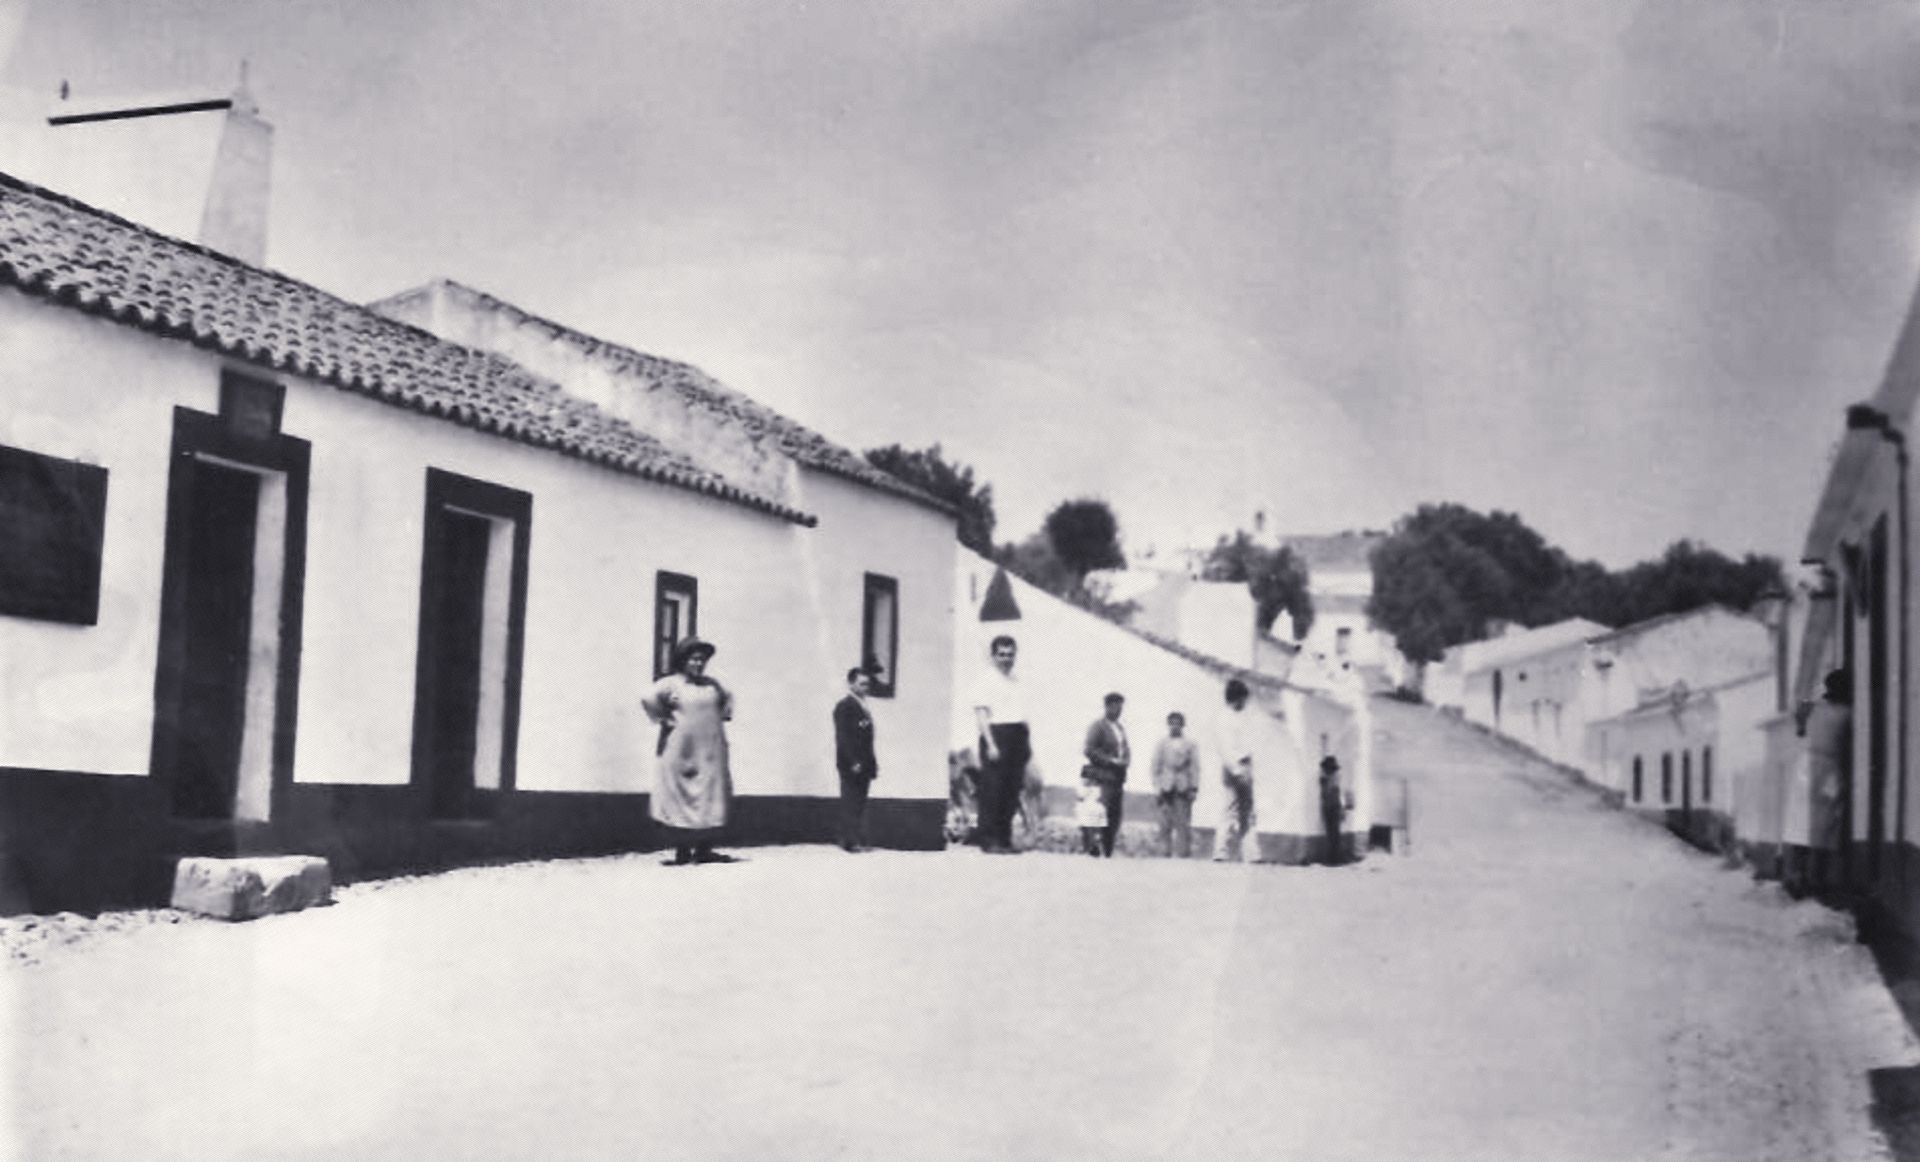 Rua onde se situavam as tabernas antigas (s/a, CMMN, s/d)